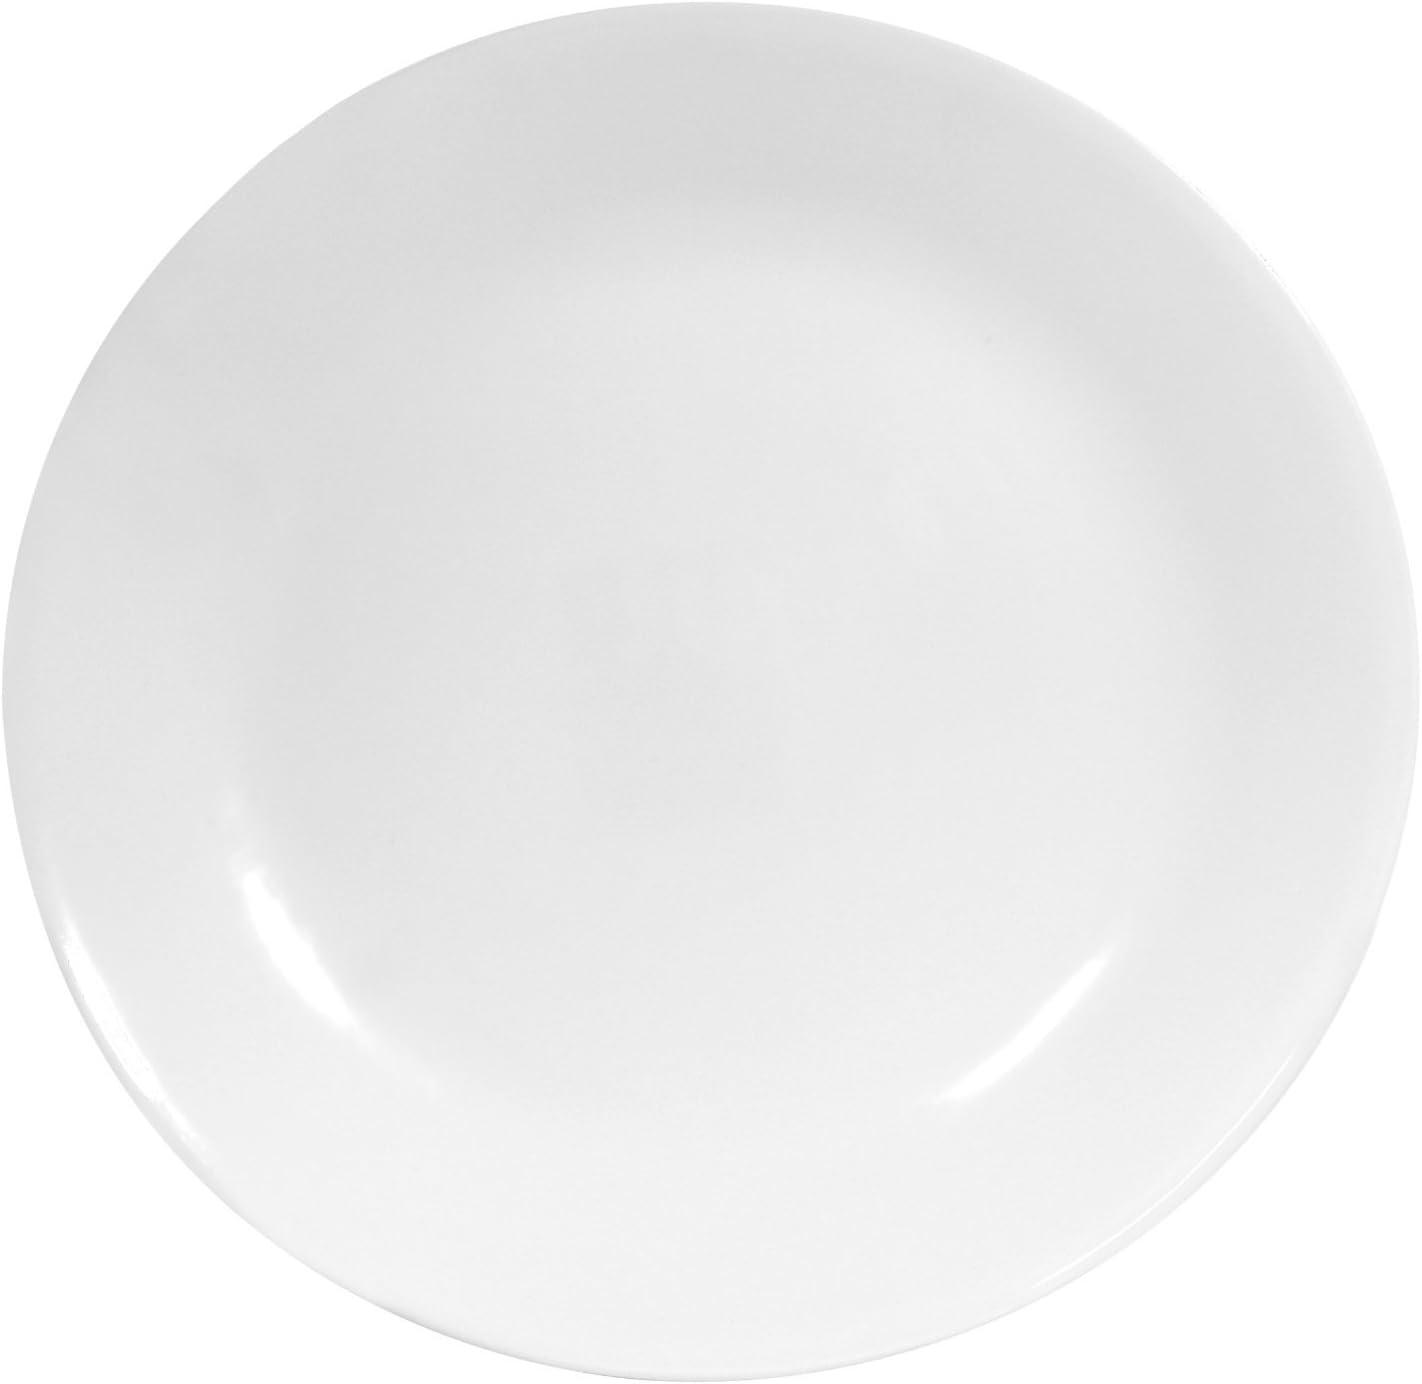 Corelle Livingware 6-Piece Dinner Plate Set, Winter Frost White (2 Sets of 6)